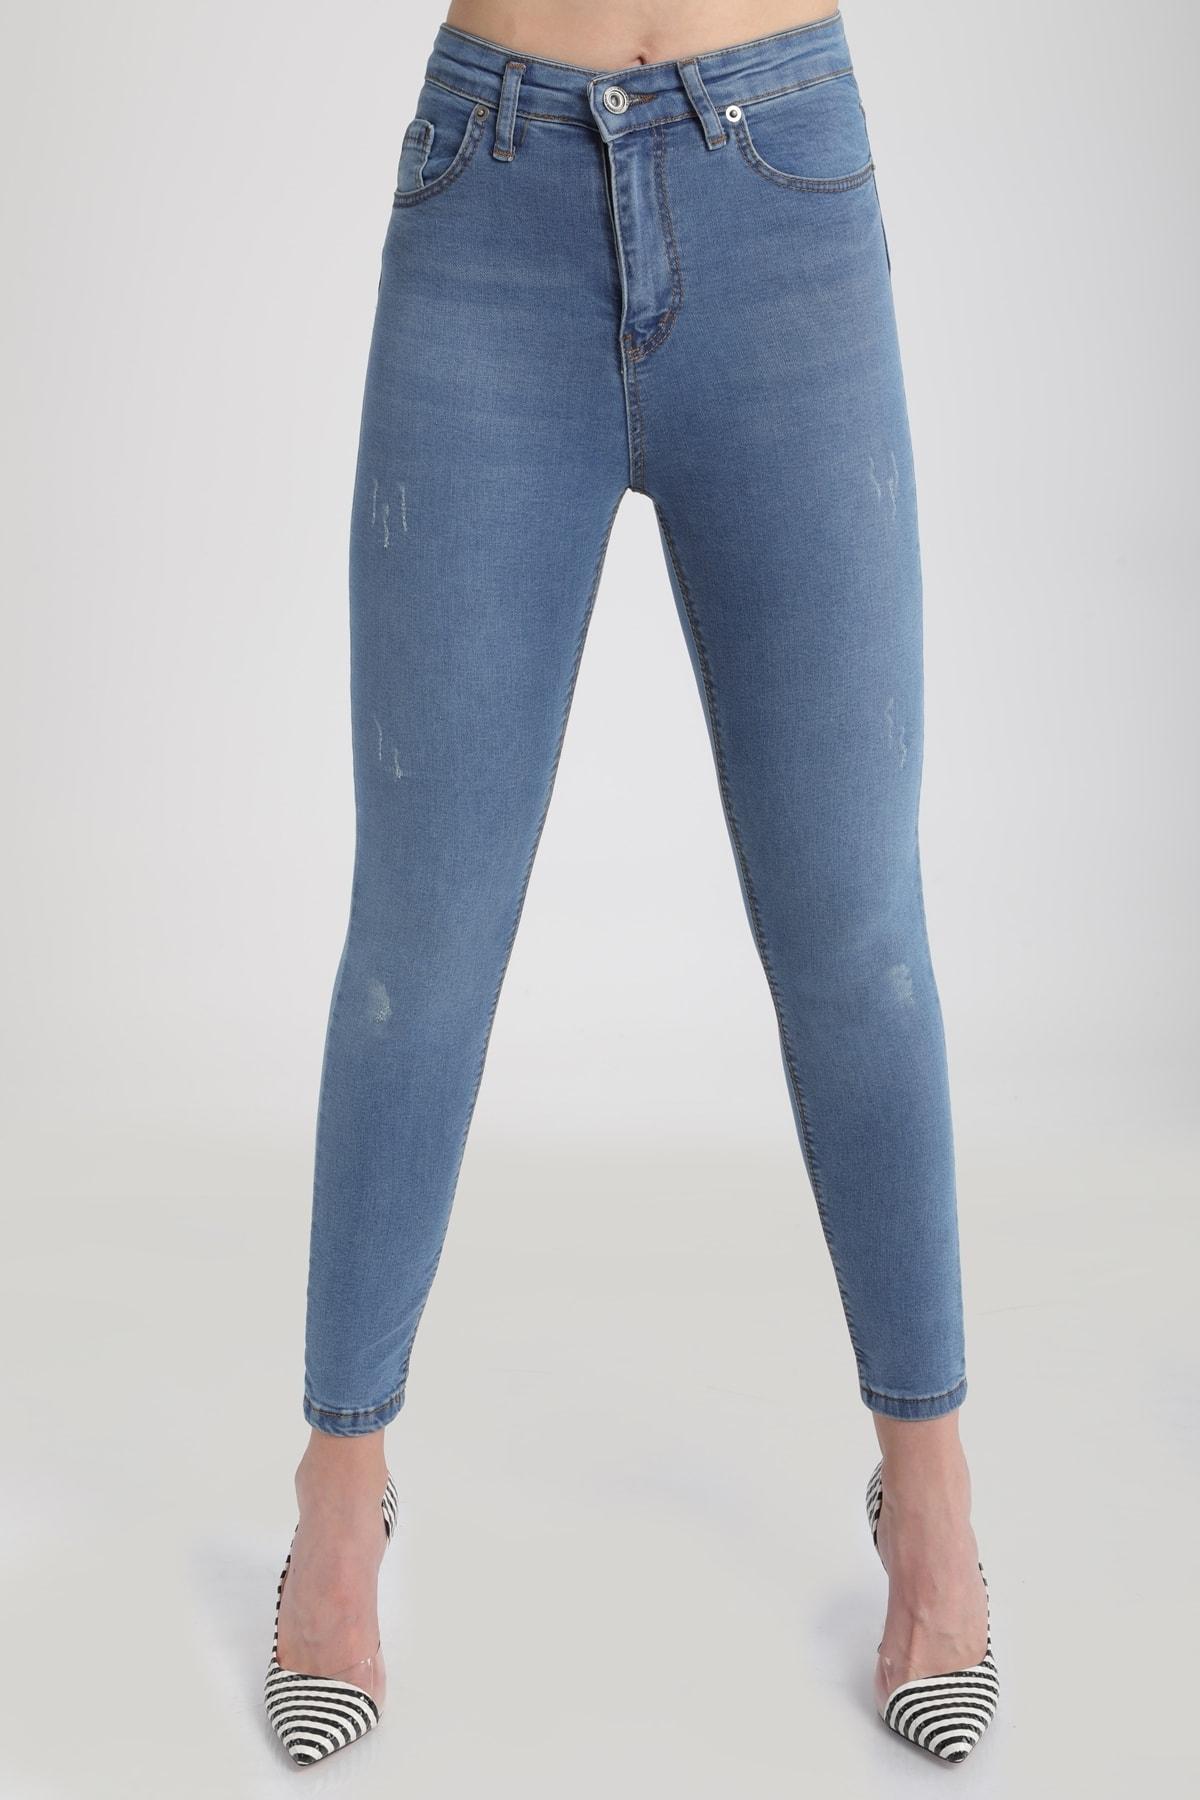 MD trend Kadın Buz Mavi Yüksek Bel Dar Paça Pantolon Jean Mdt3409 2